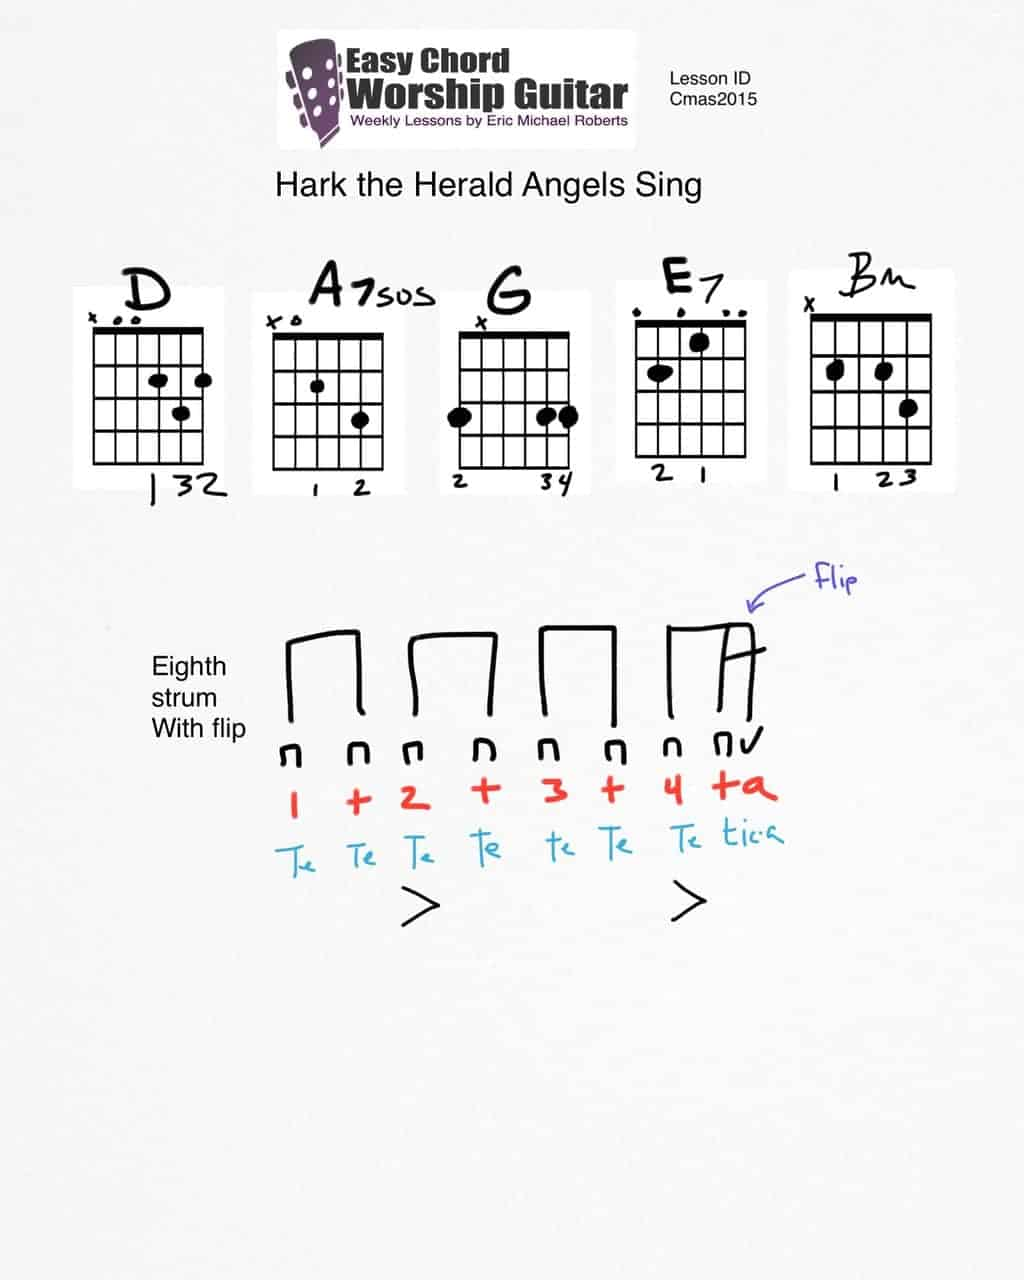 harkthehearld-lesson